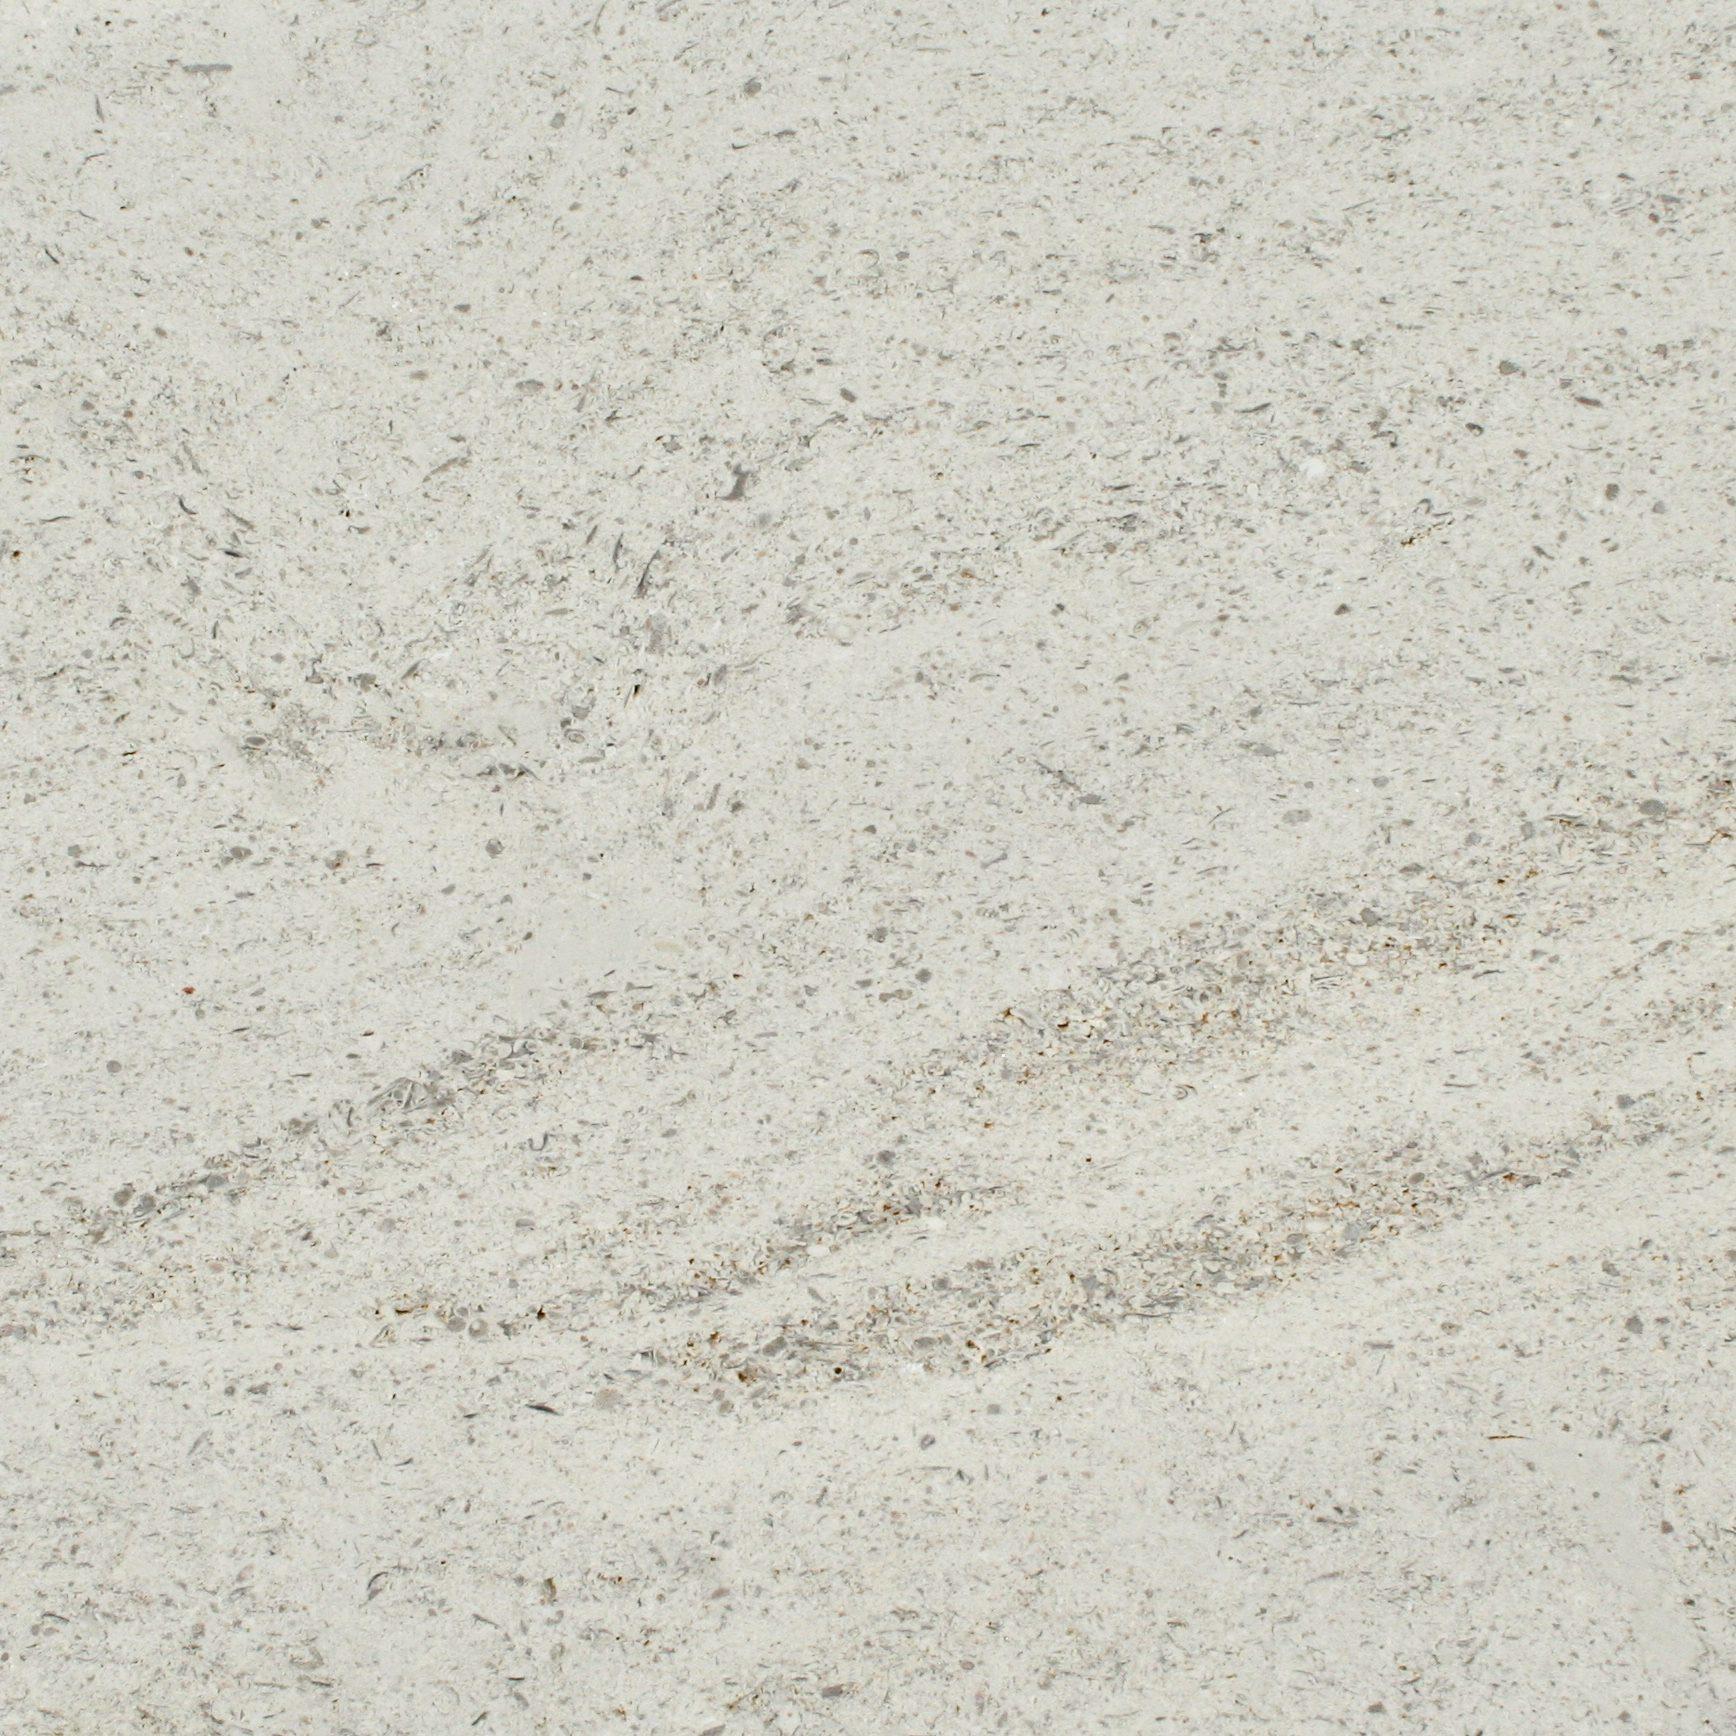 French limestone Chamesson